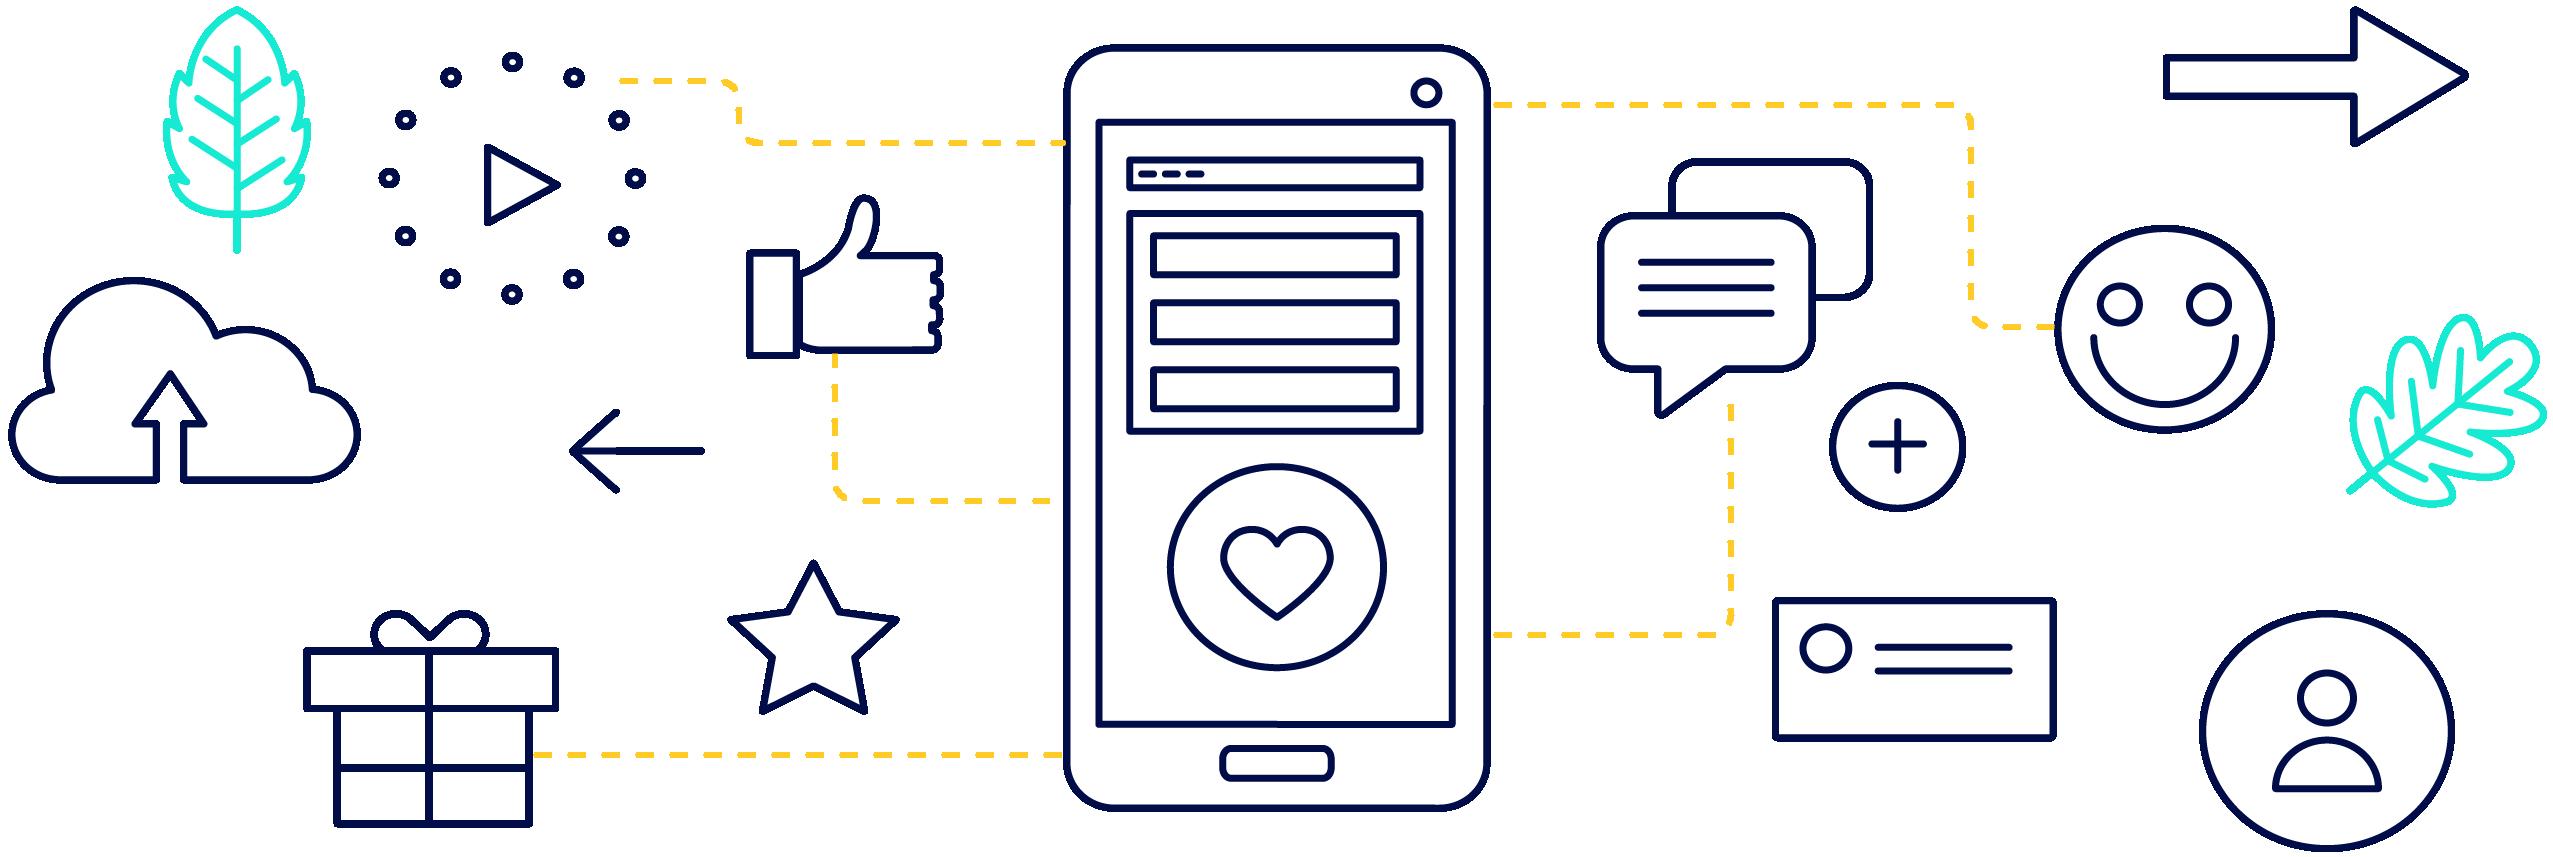 Articulate - 02-15 eye-opening B2B social media statistics - The best B2B social media platforms - The best B2B social media platforms-01